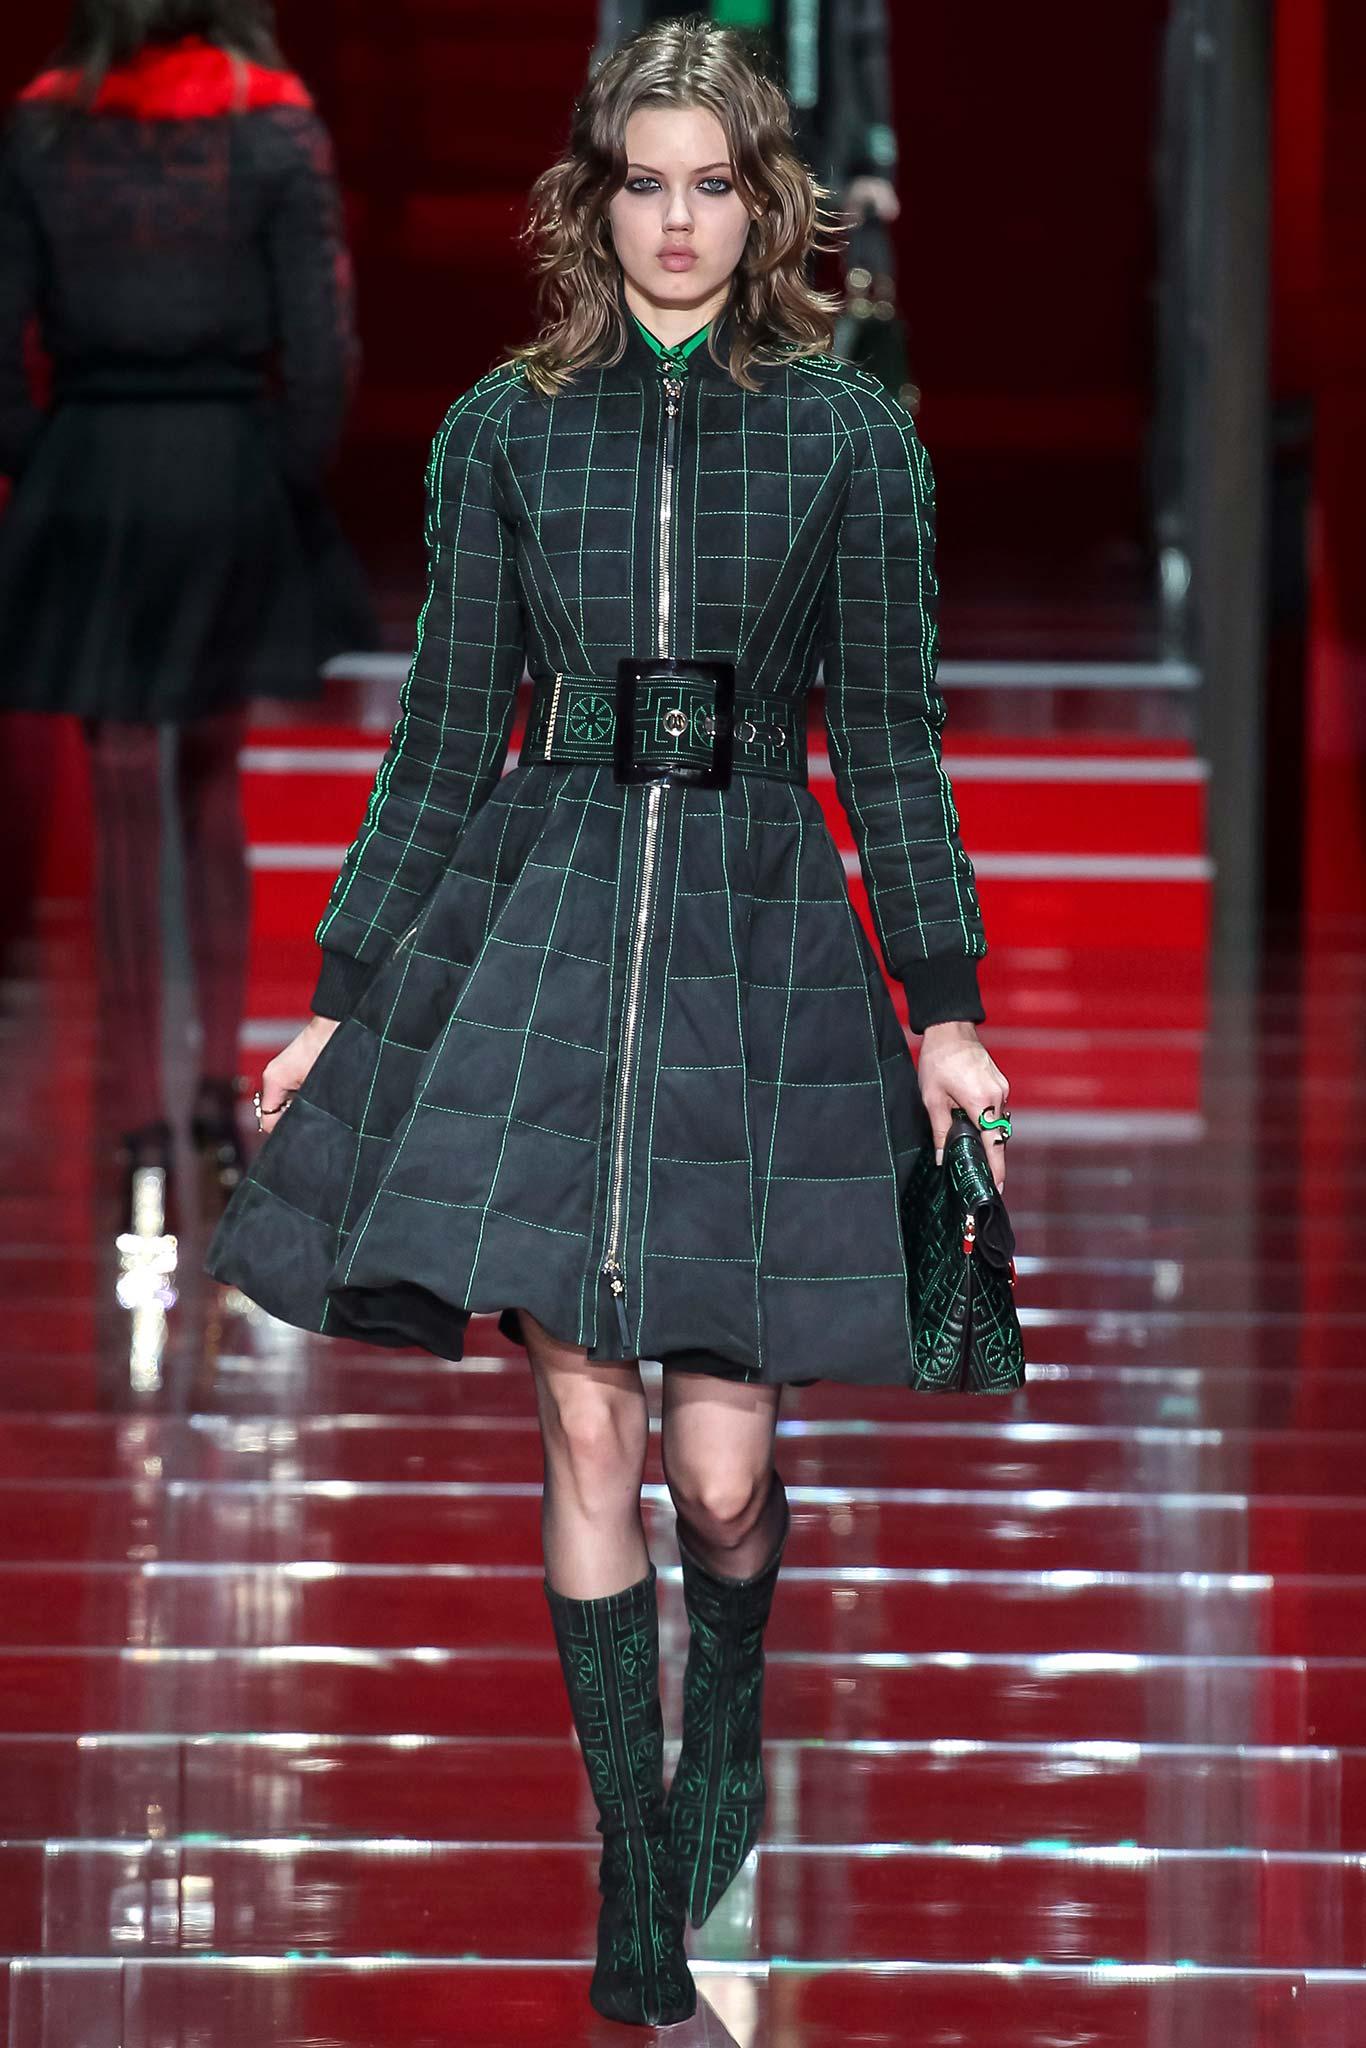 versace-fall-2015- Ready-To-Wear